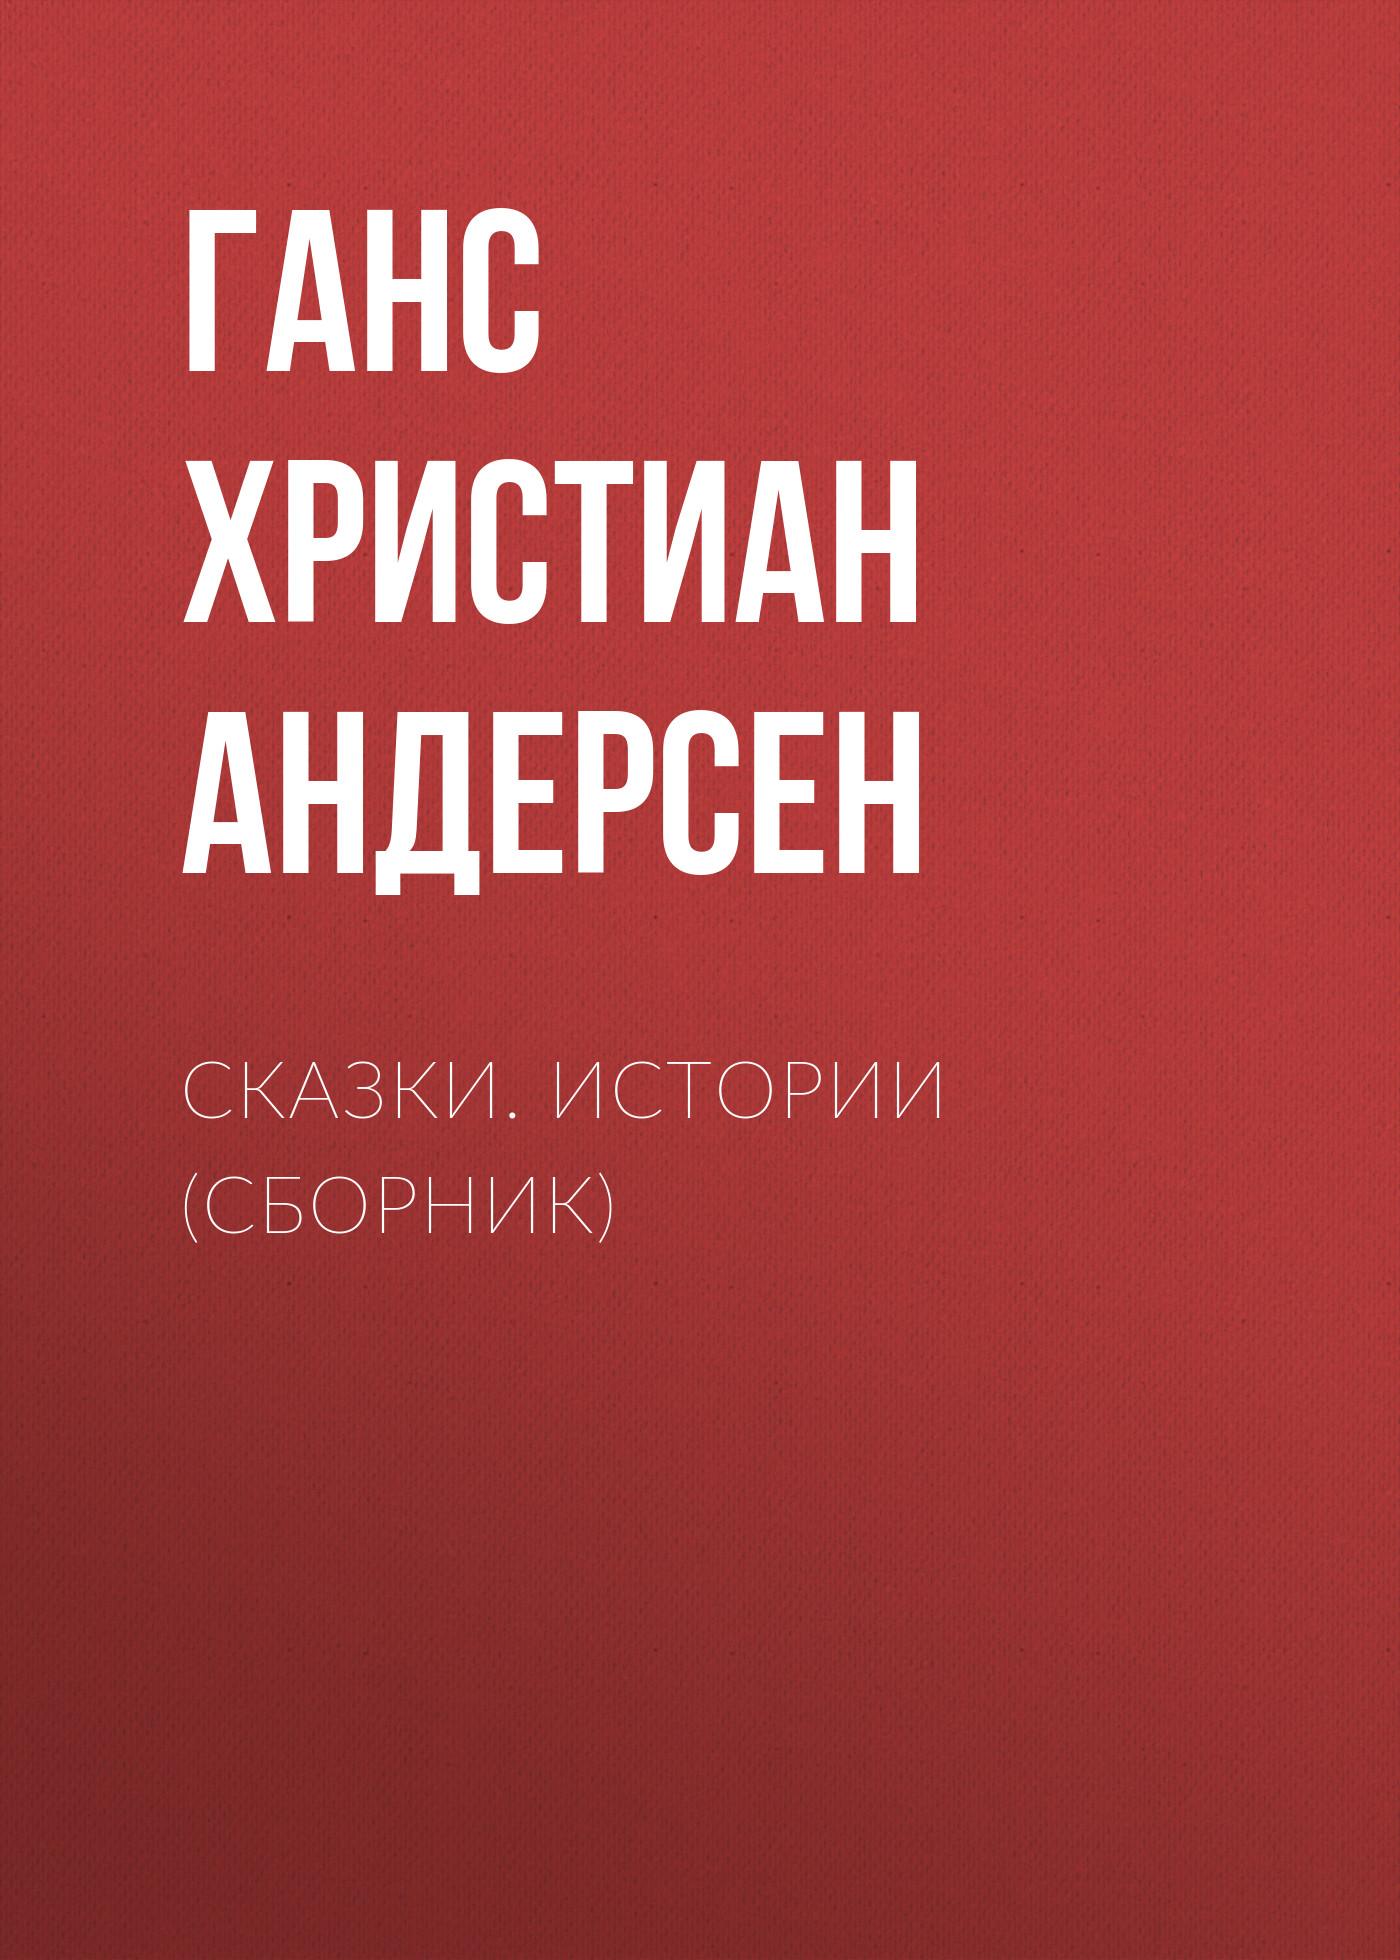 Ганс Христиан Андерсен Сказки. Истории (сборник) ганс христиан андерсен сказки